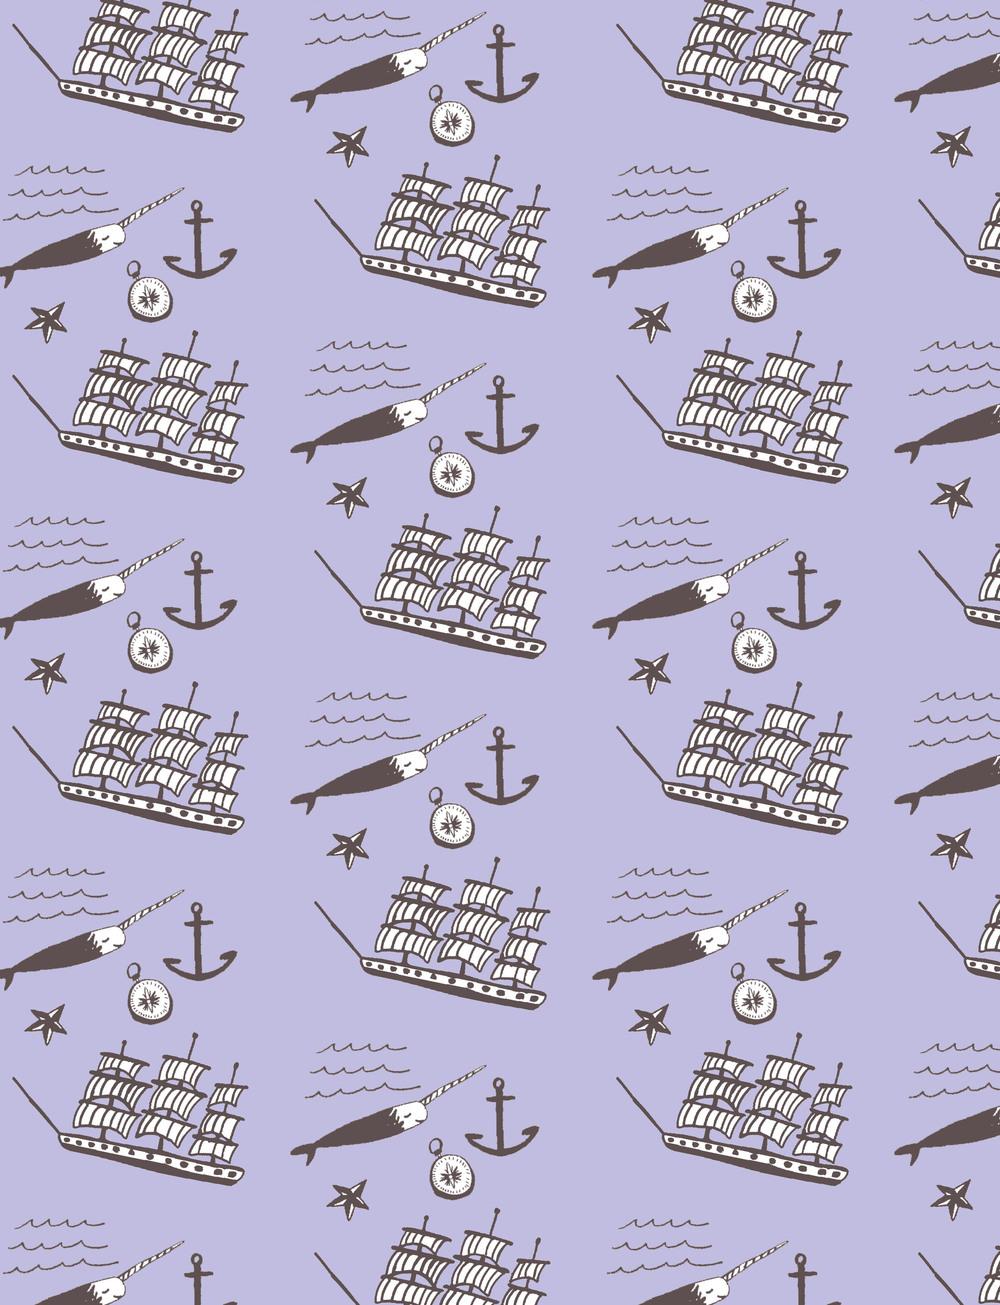 whalepattern.jpg